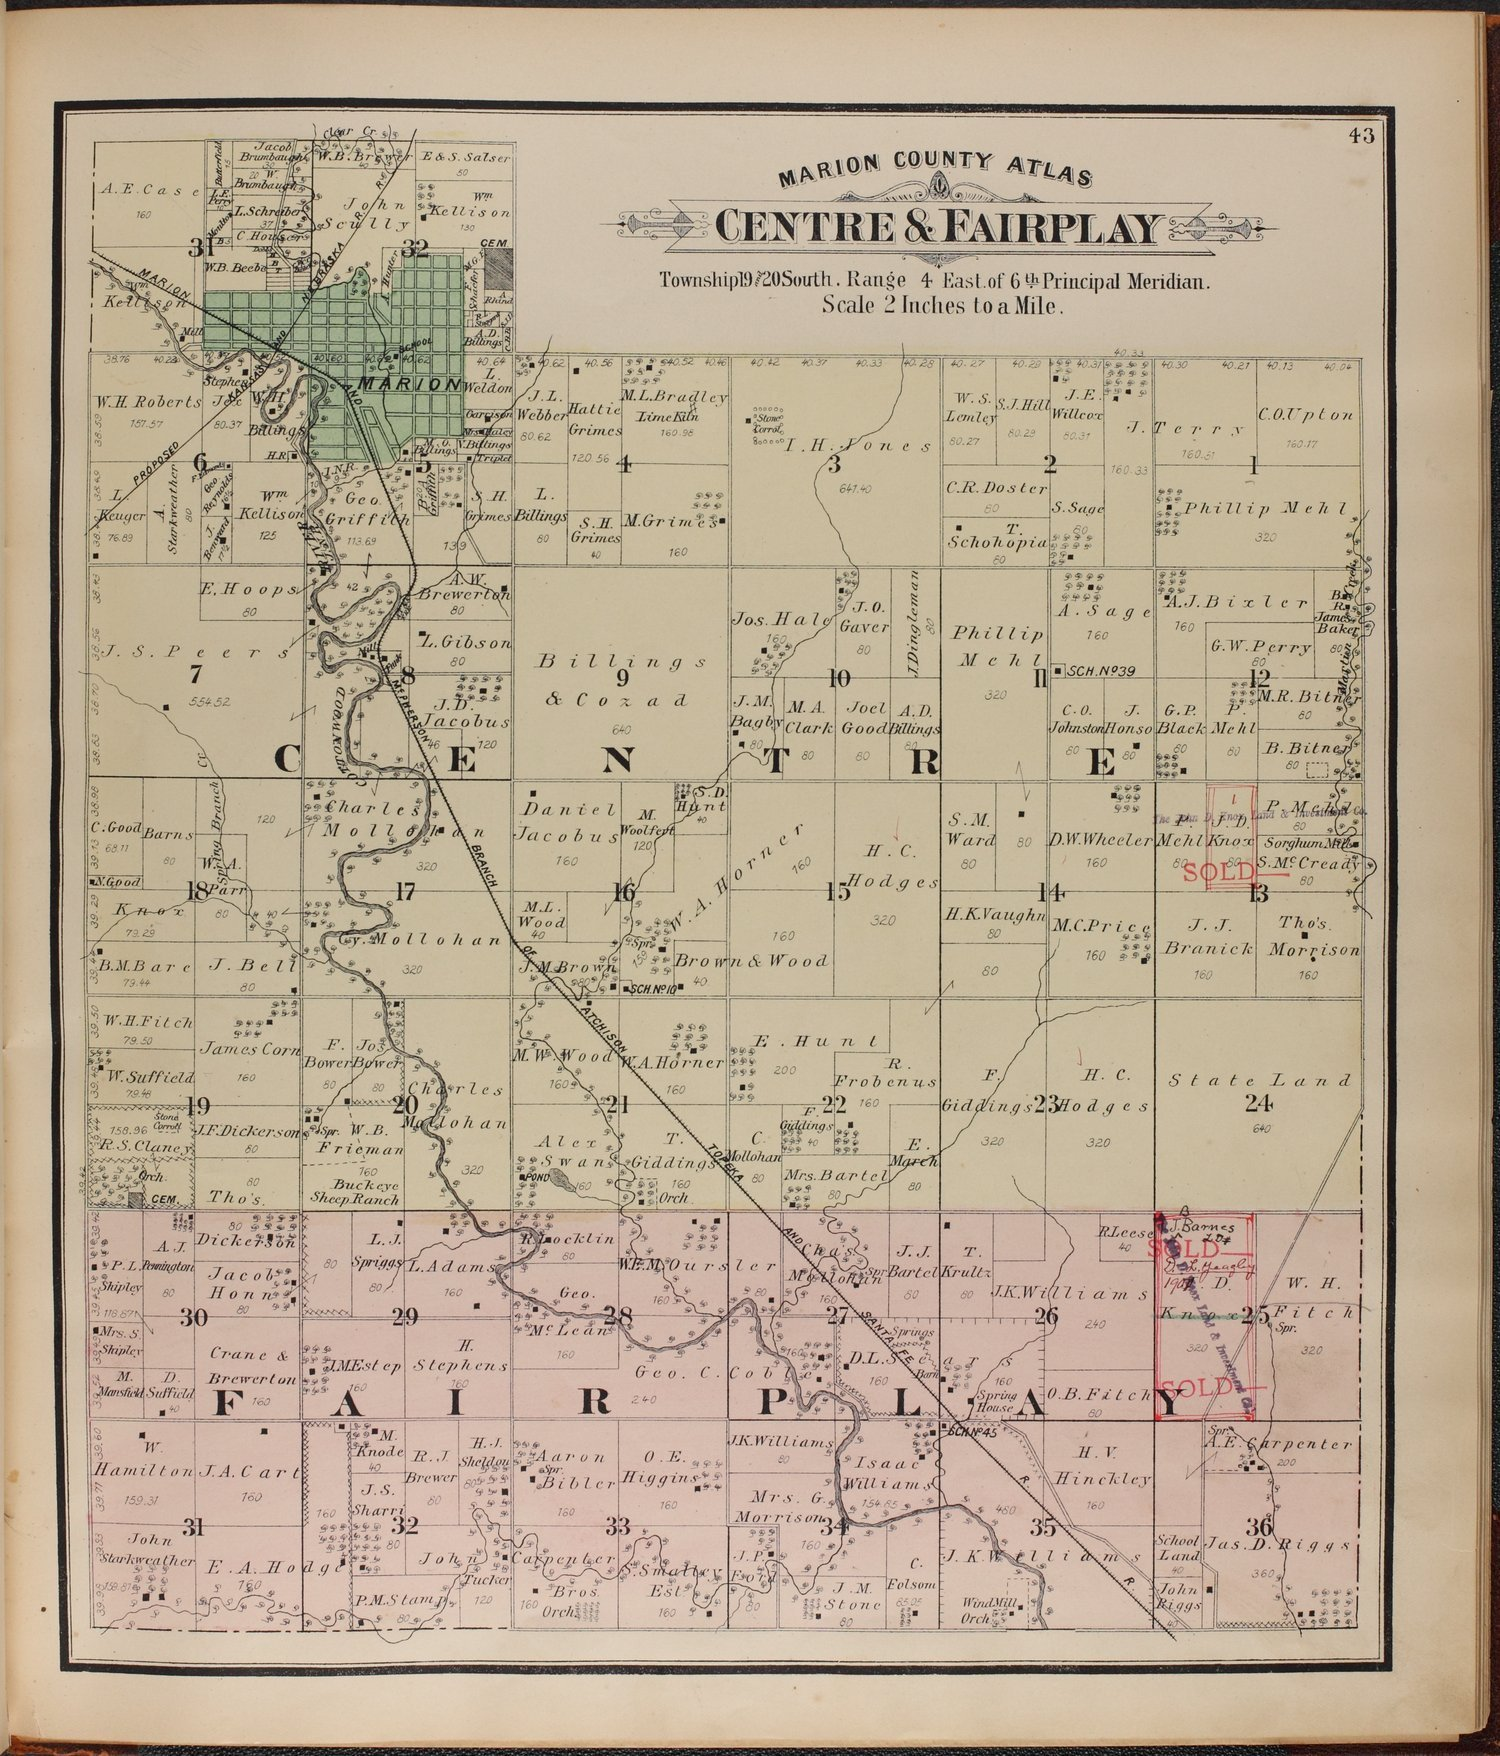 Atlas of Marion County, Kansas - 43